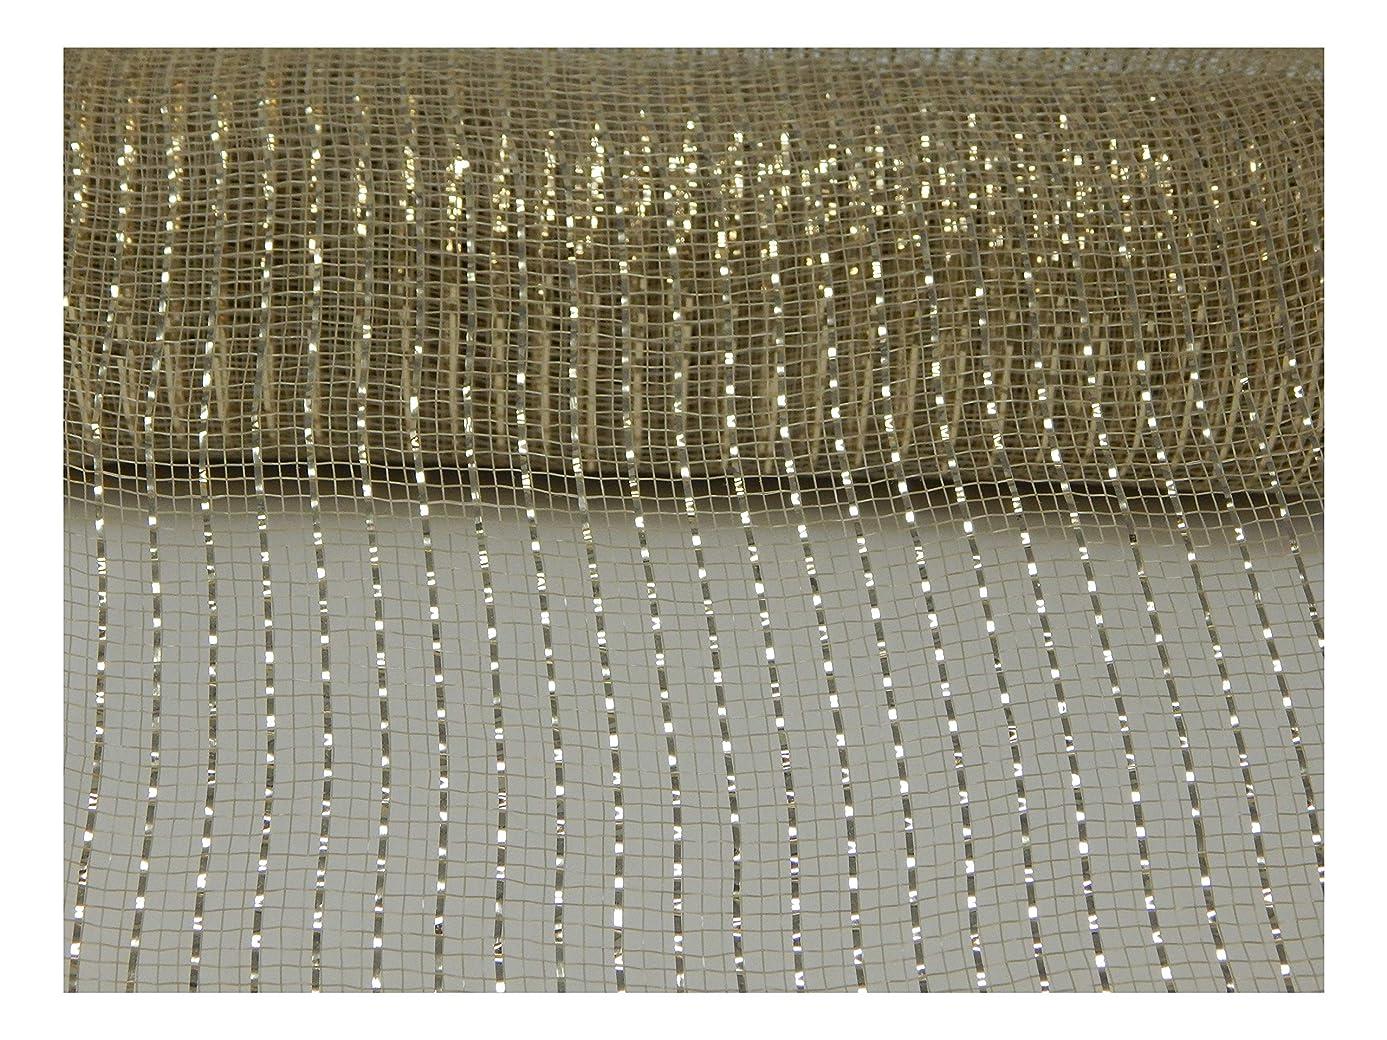 Floral Supply Online - 10 inch x 30 feet Metallic Deco Poly Mesh Ribbon (Light Gold, 10